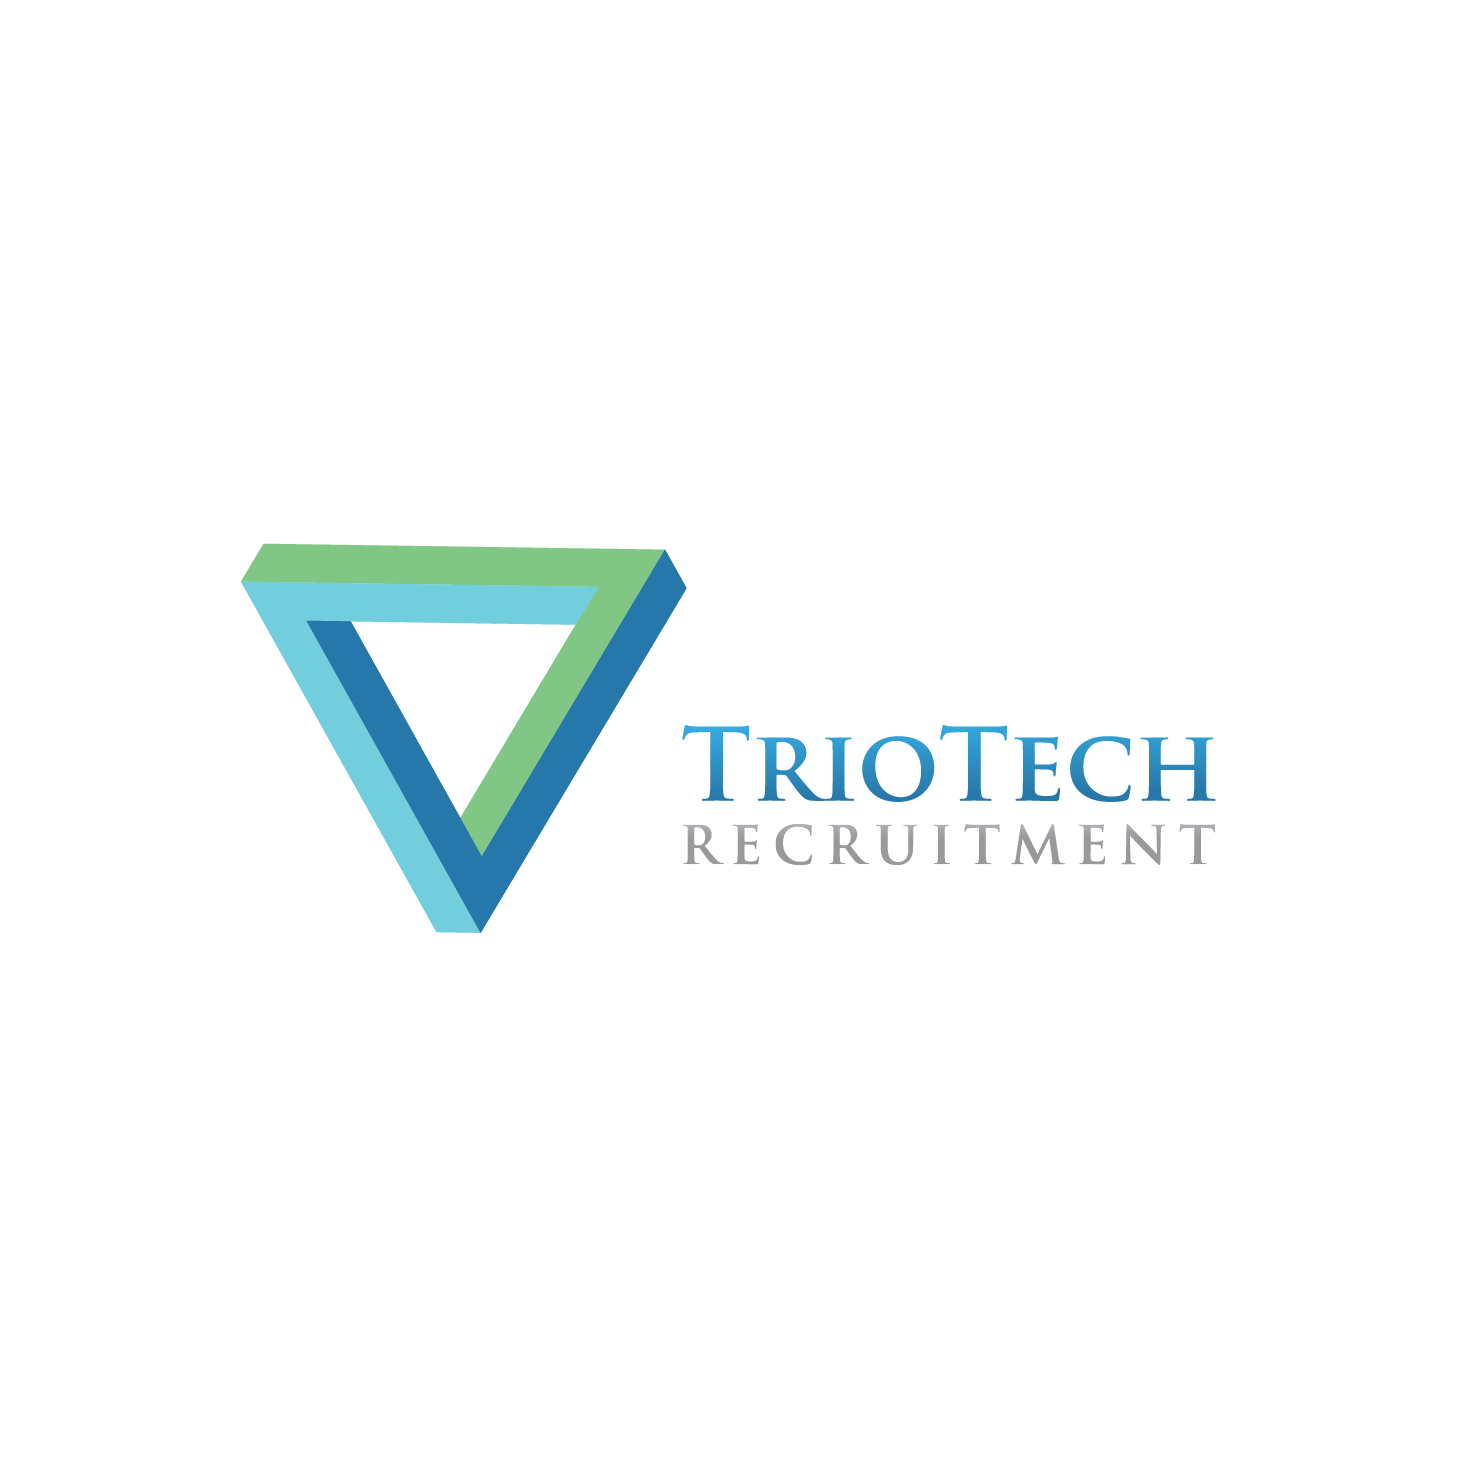 07_Testimonial_TrioTech-Logo-01